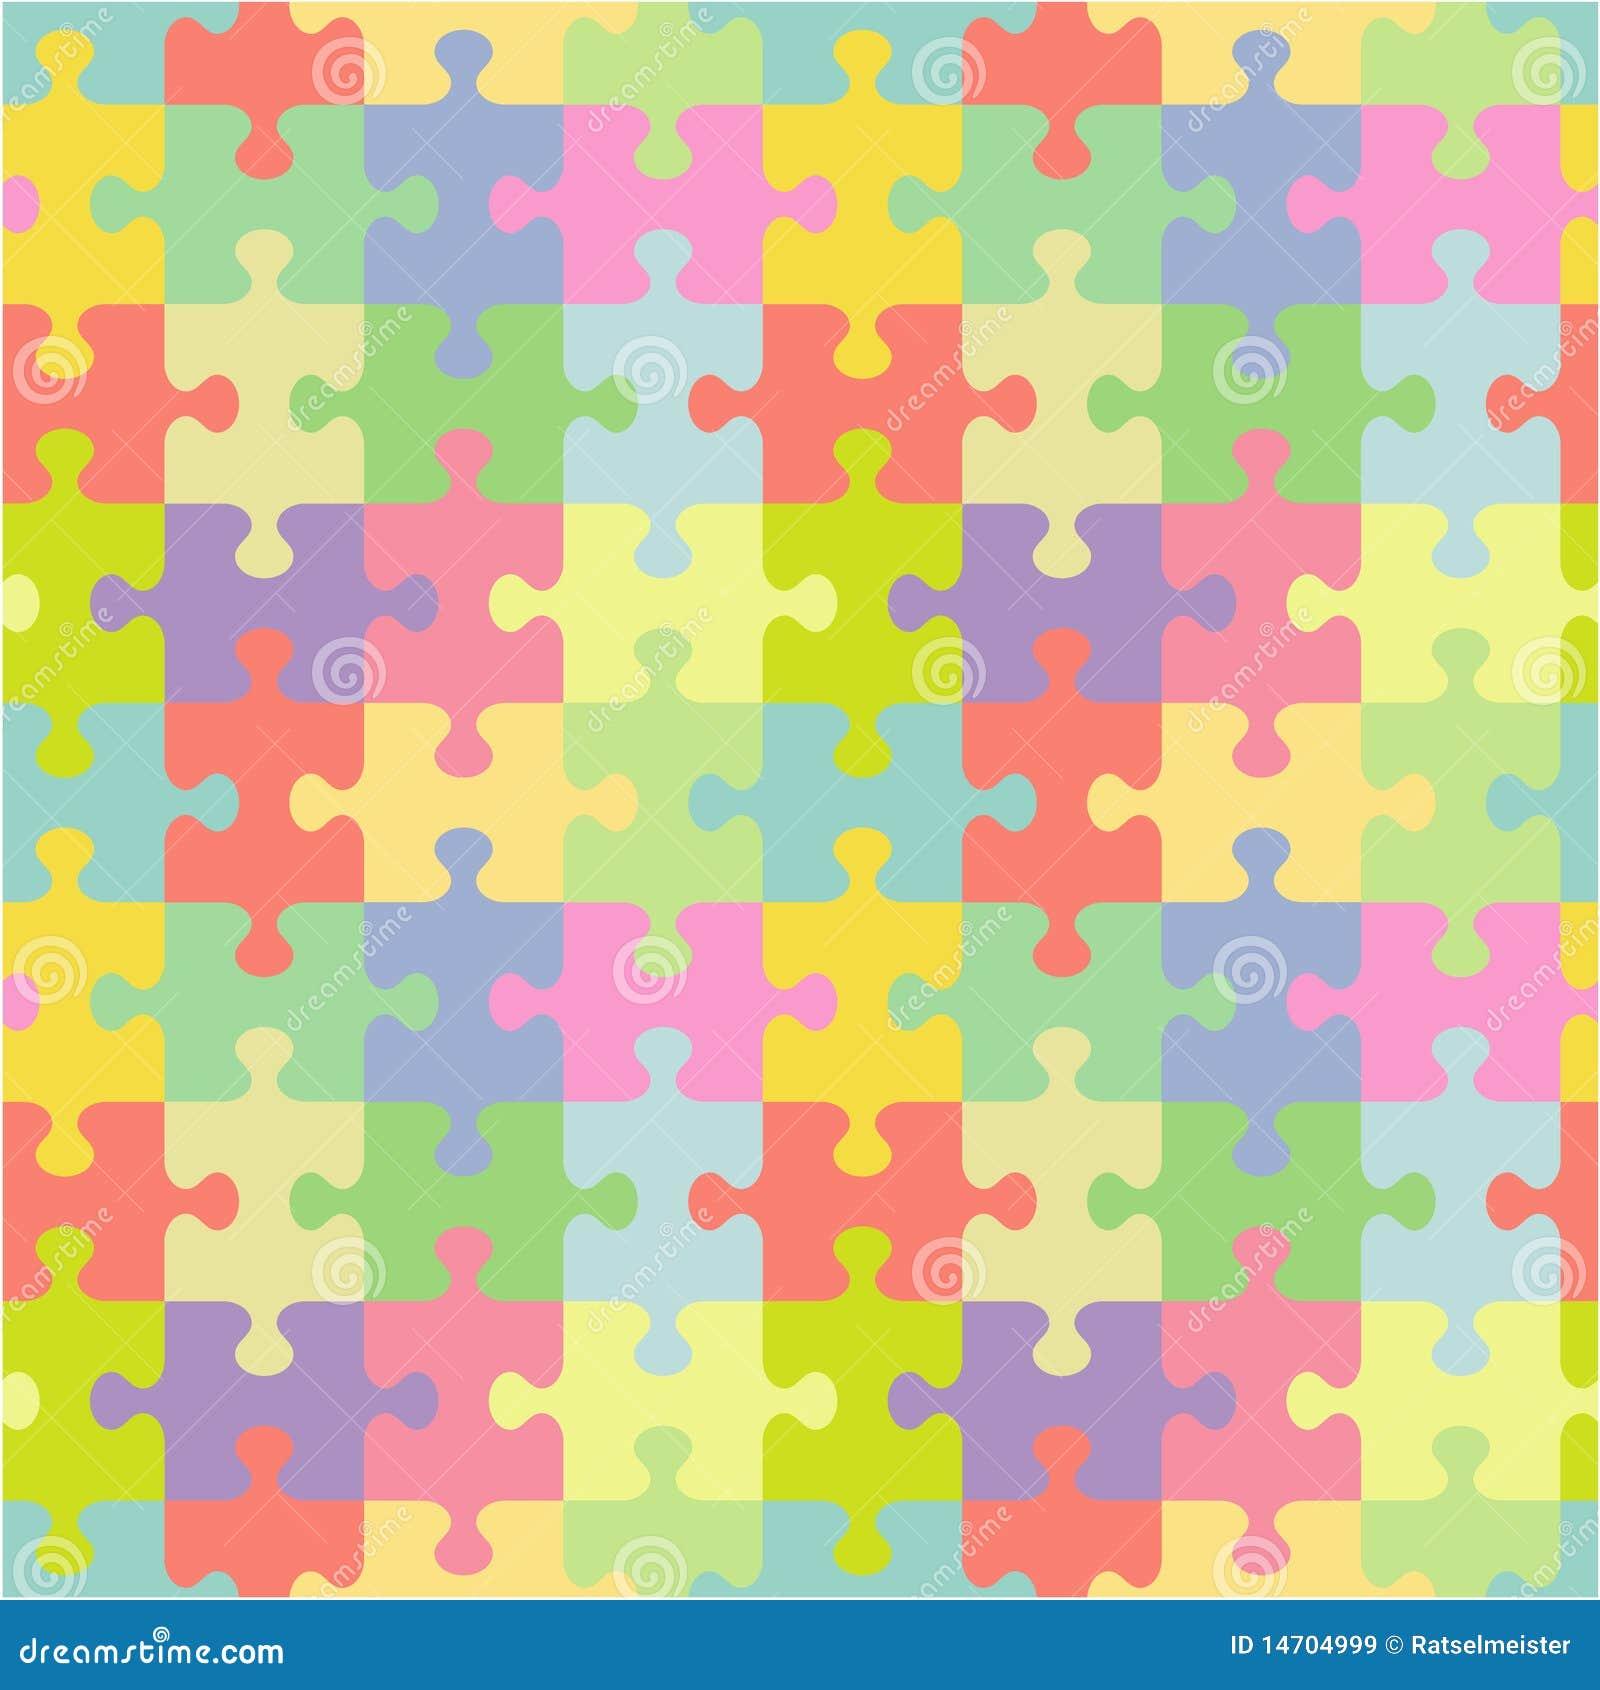 Puzzle Wallpaper Colorful